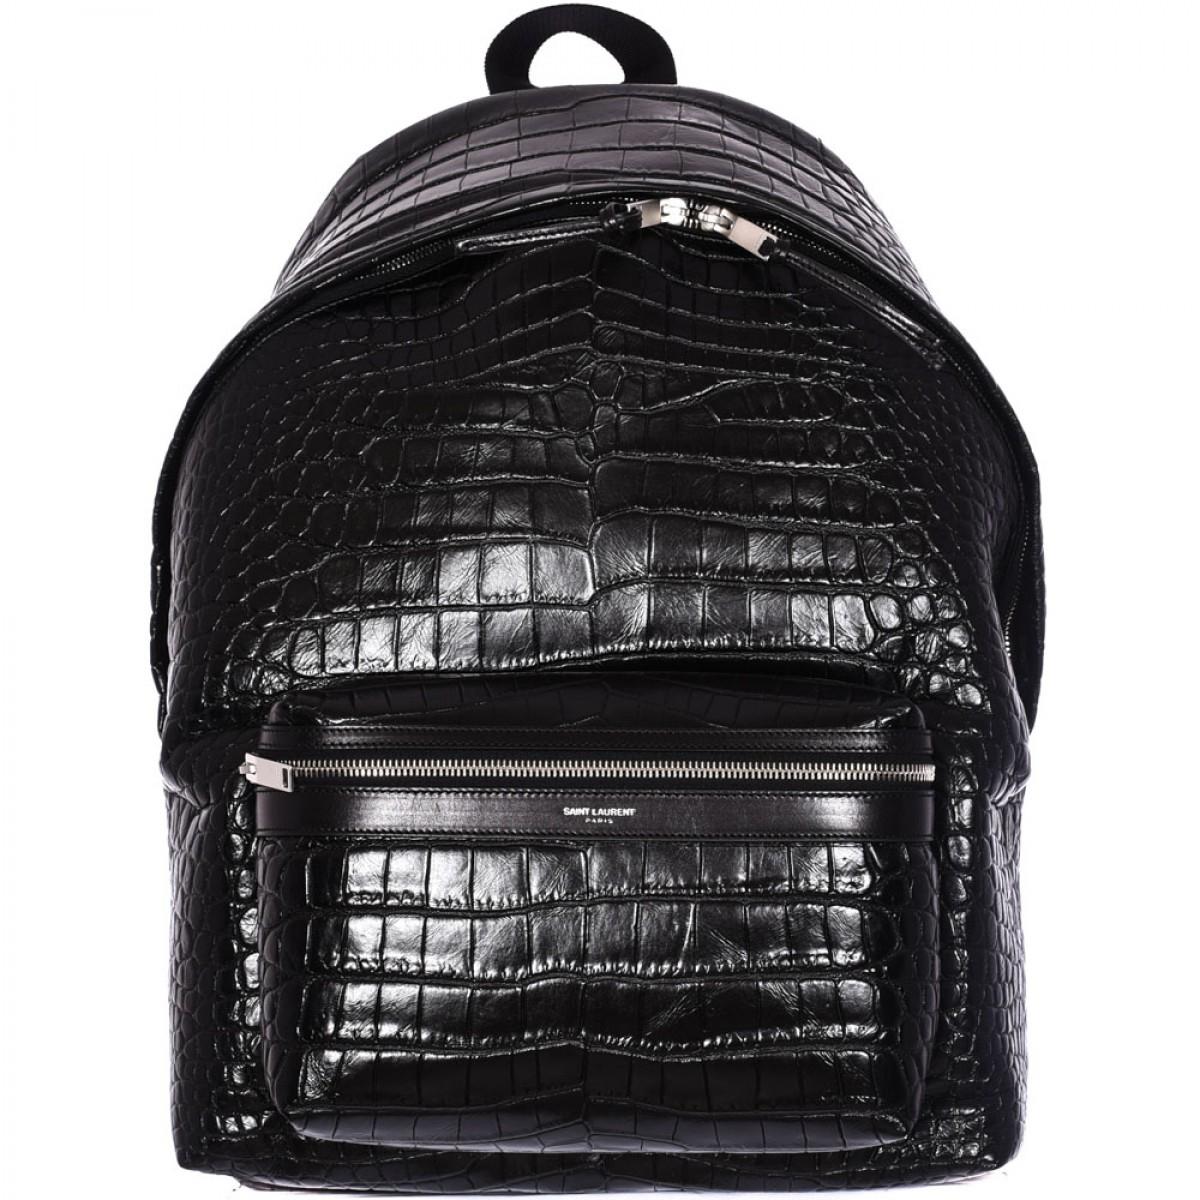 Saint laurent Black Leather Crocodile Print Backpack in Black for ...